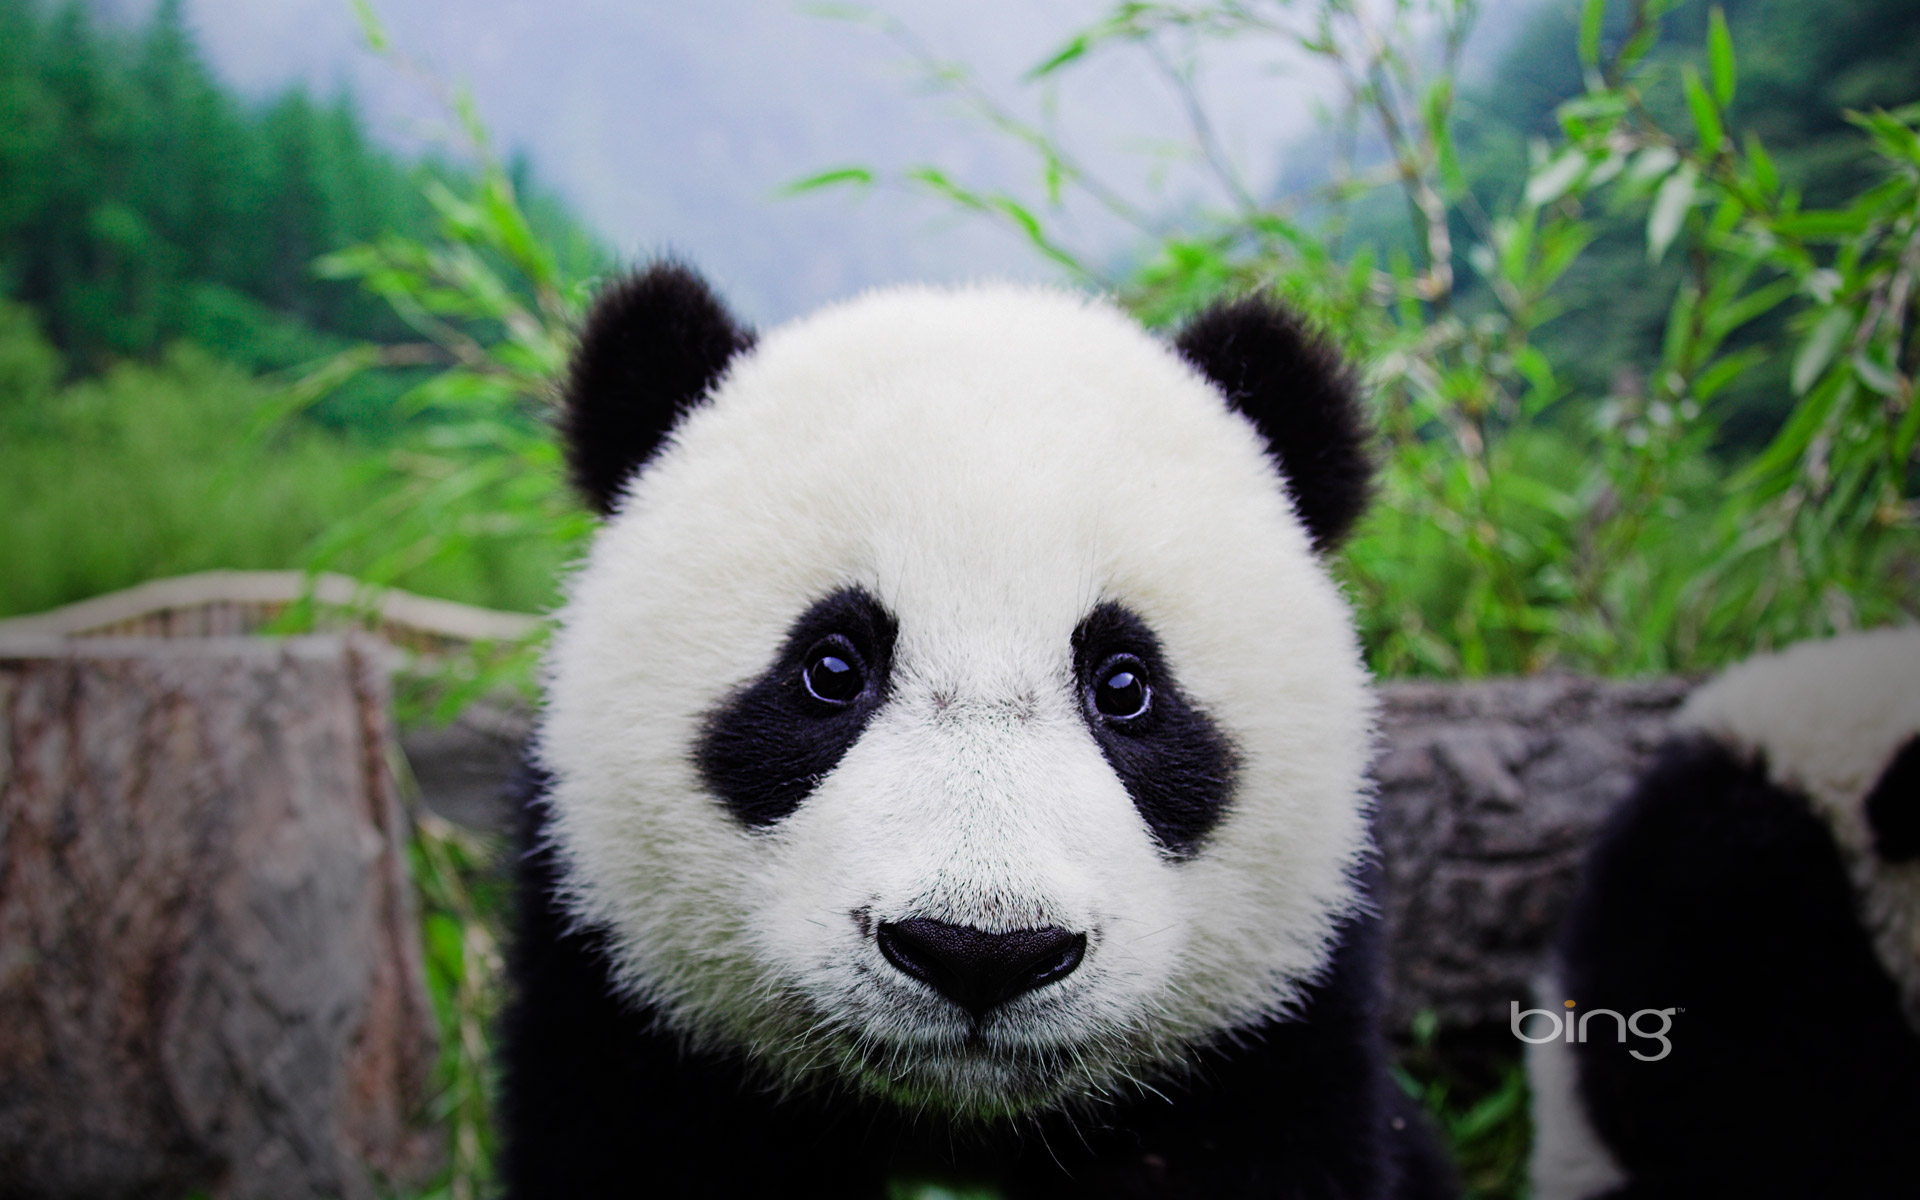 Panda Desktop Wallpaper Backgrounds WindowsObservercom 1920x1200